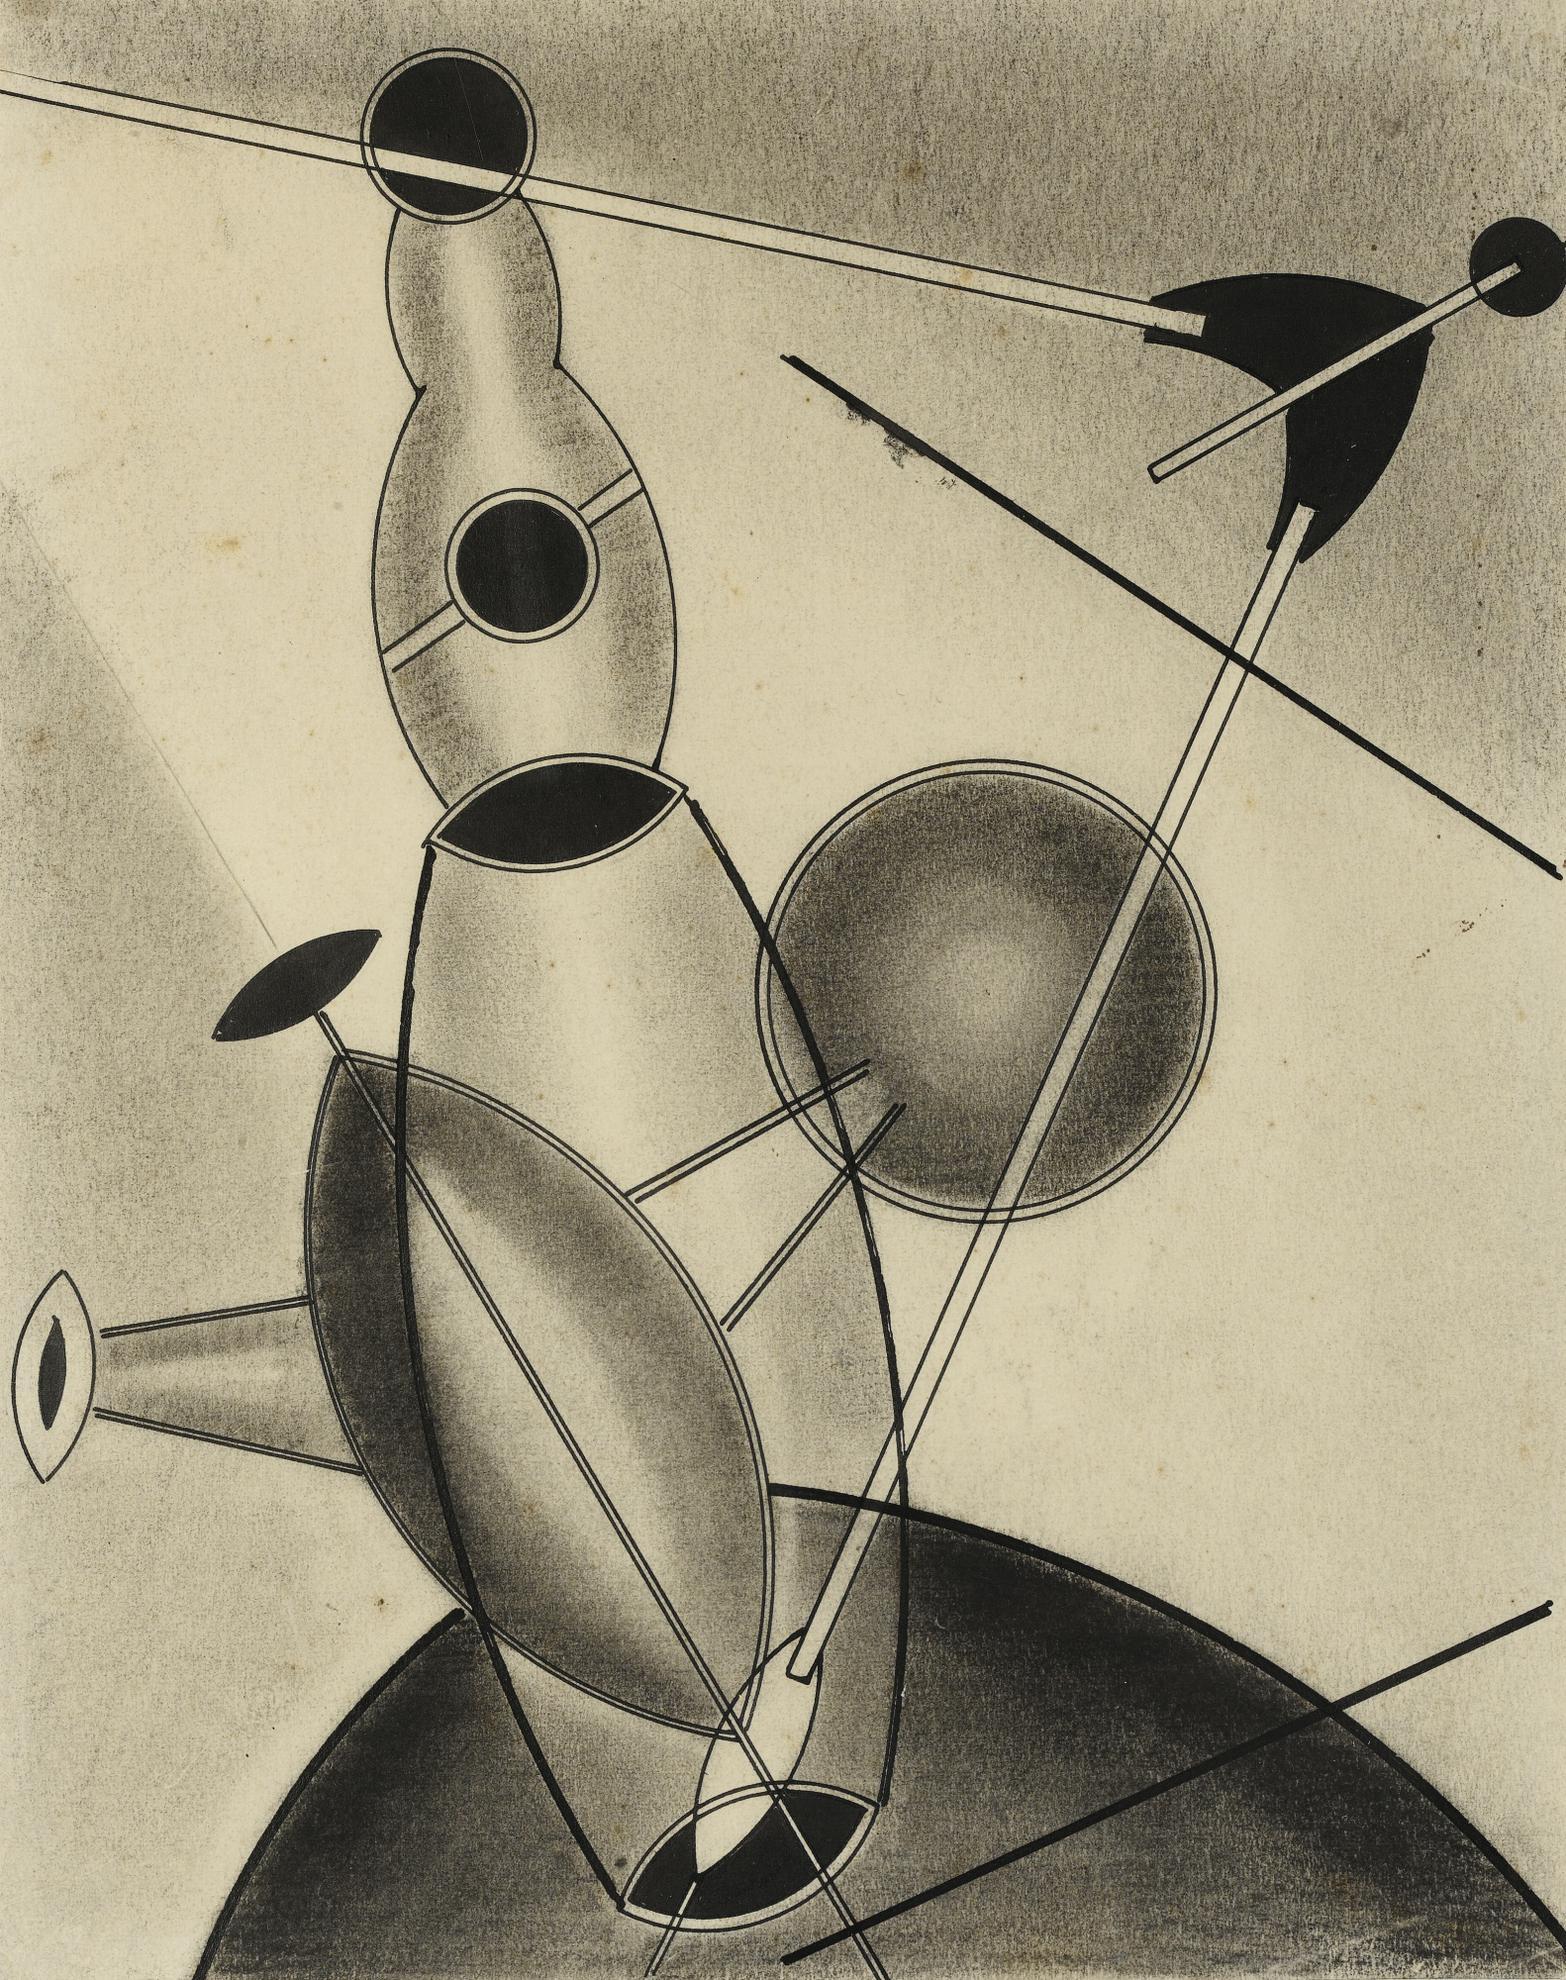 Thijs Rinsema - Compass-1930